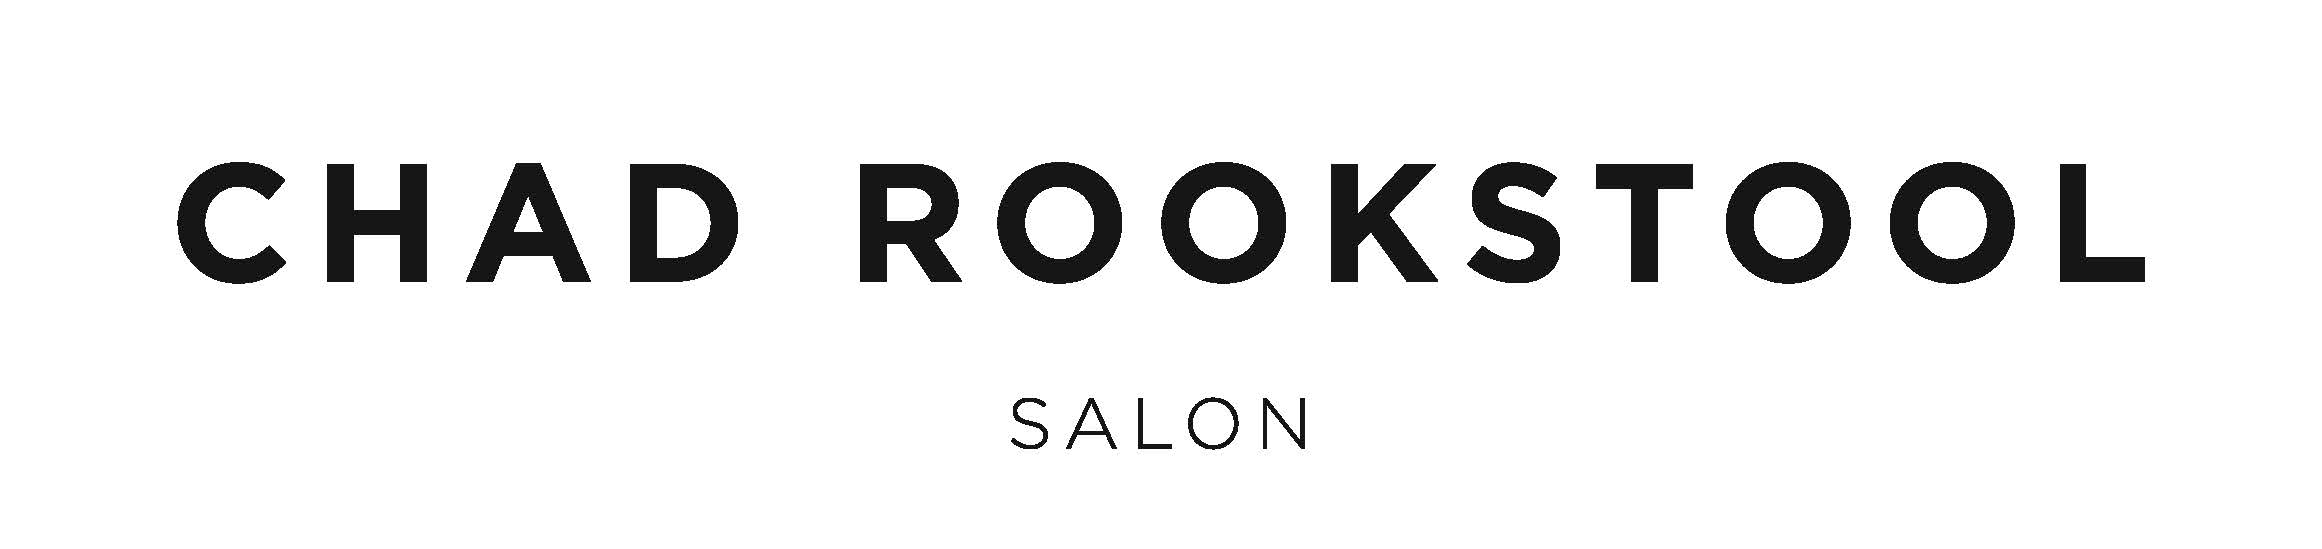 chadroockstool_logo.jpg